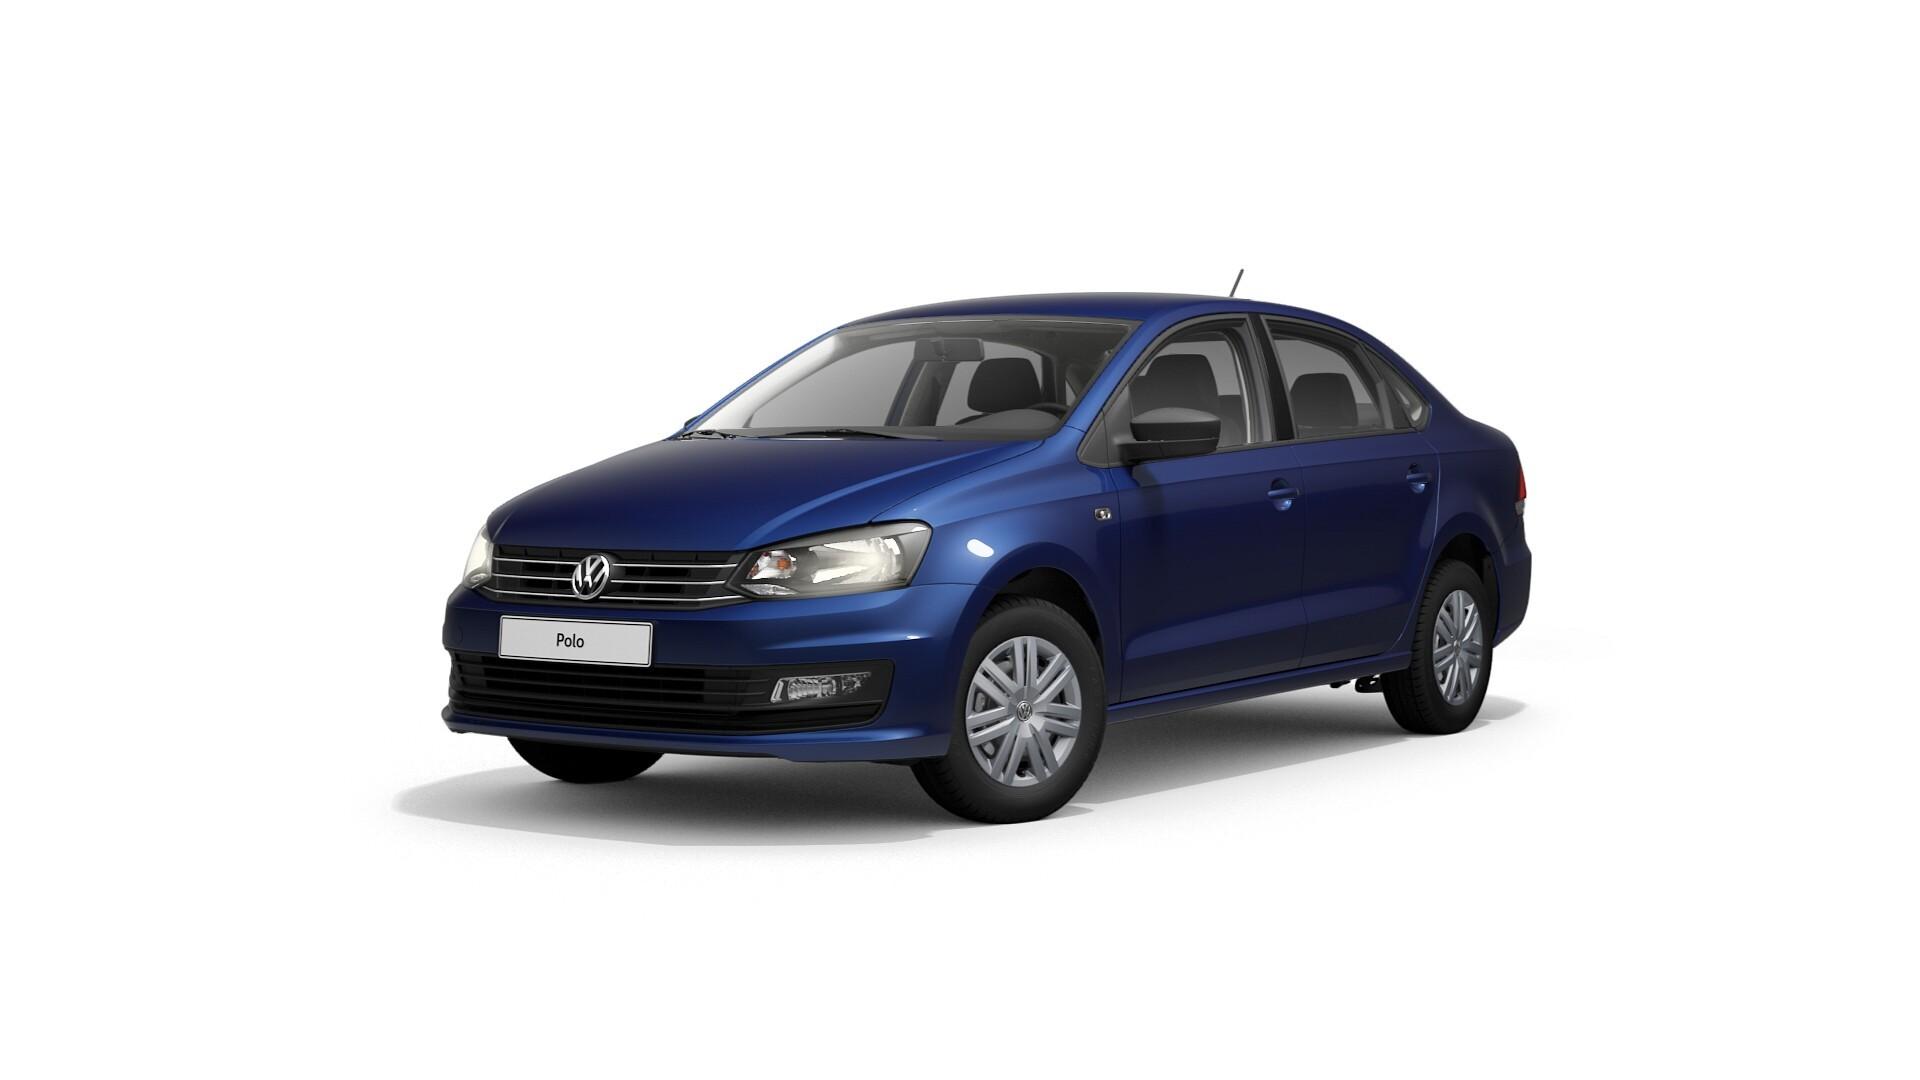 Volkswagen Polo Седан (Trendline)